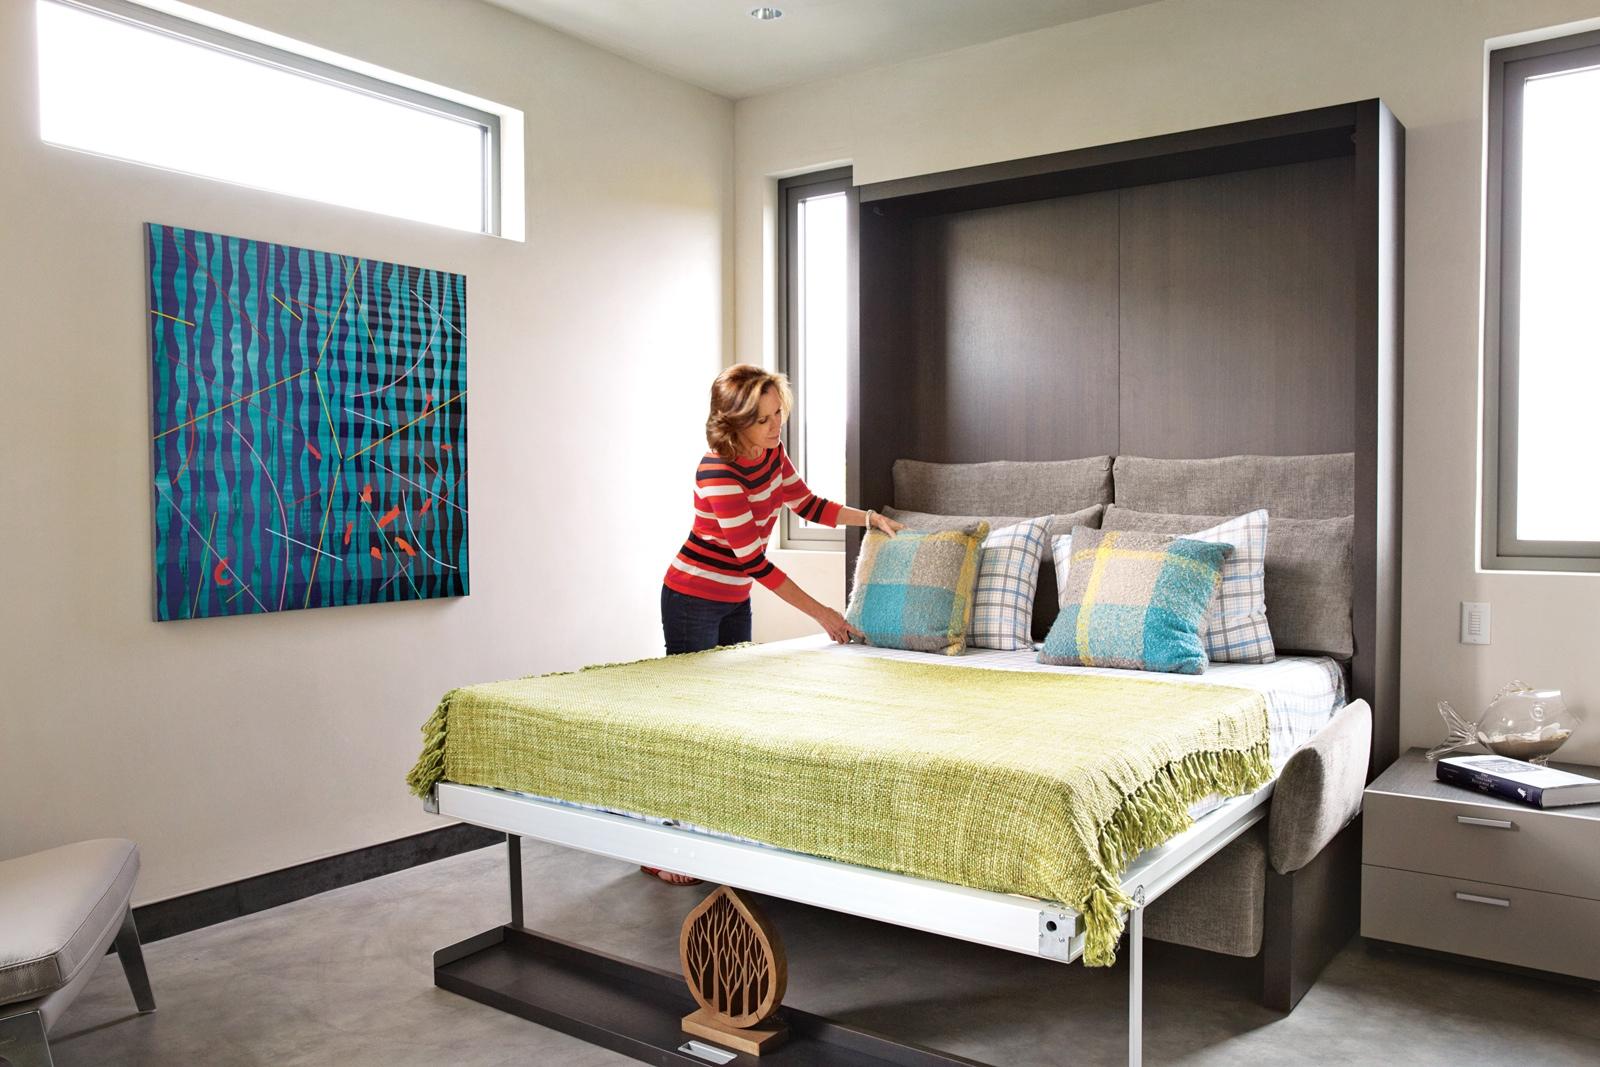 13-Guest-bed-design